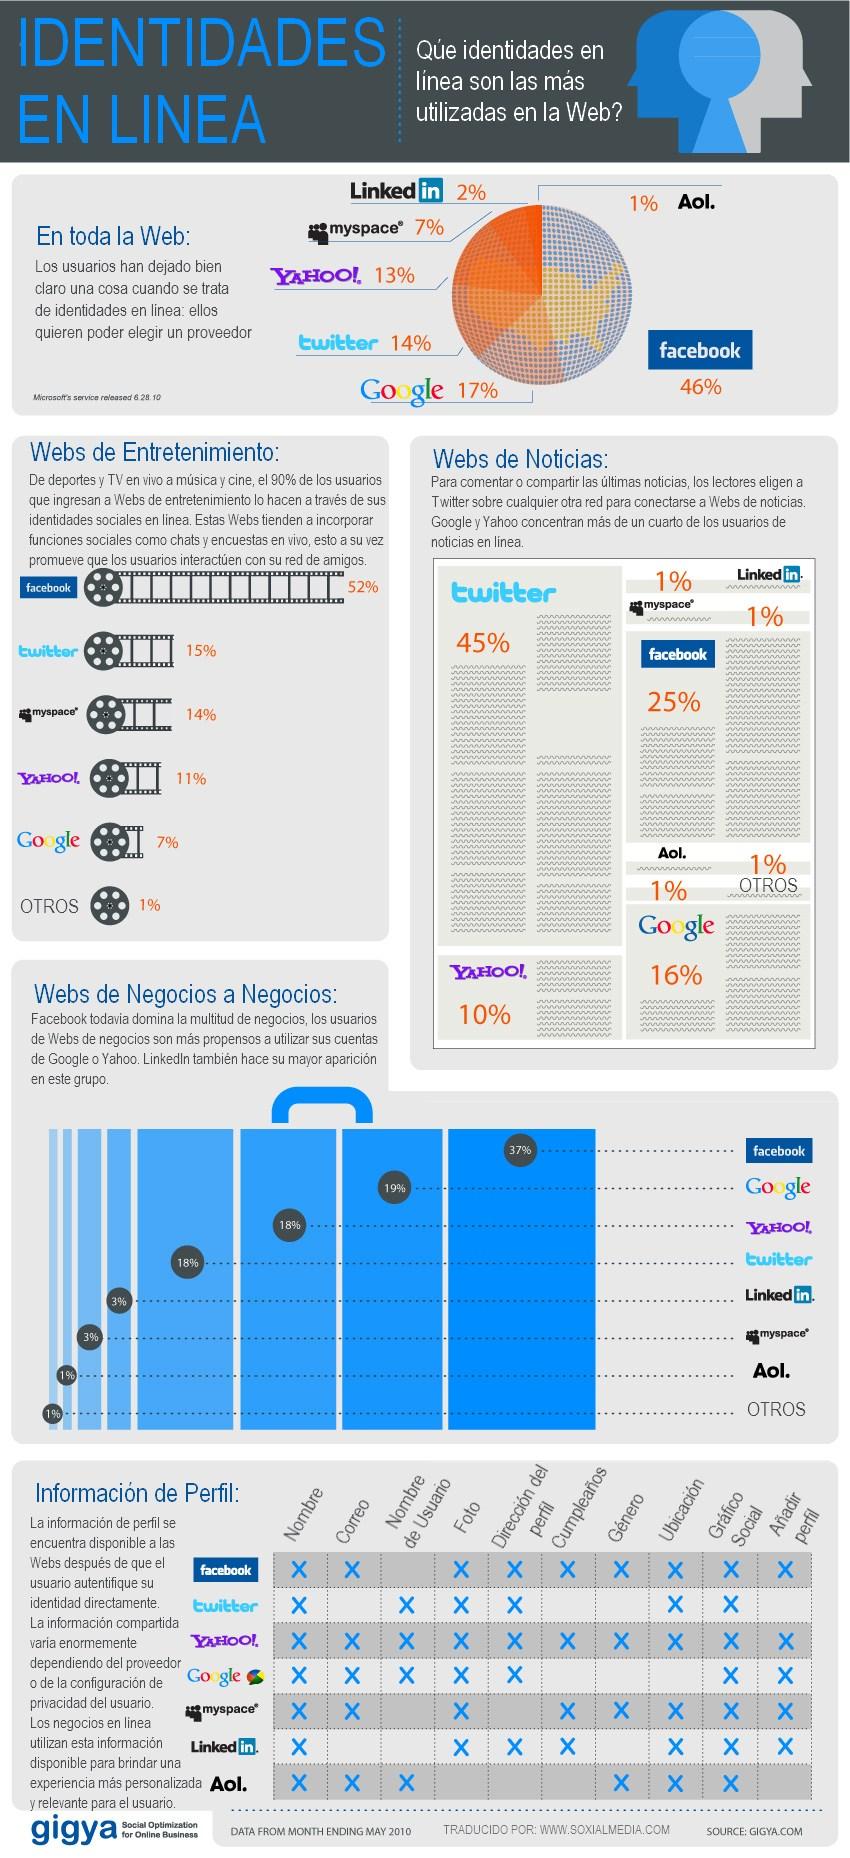 identidades en linea infografia